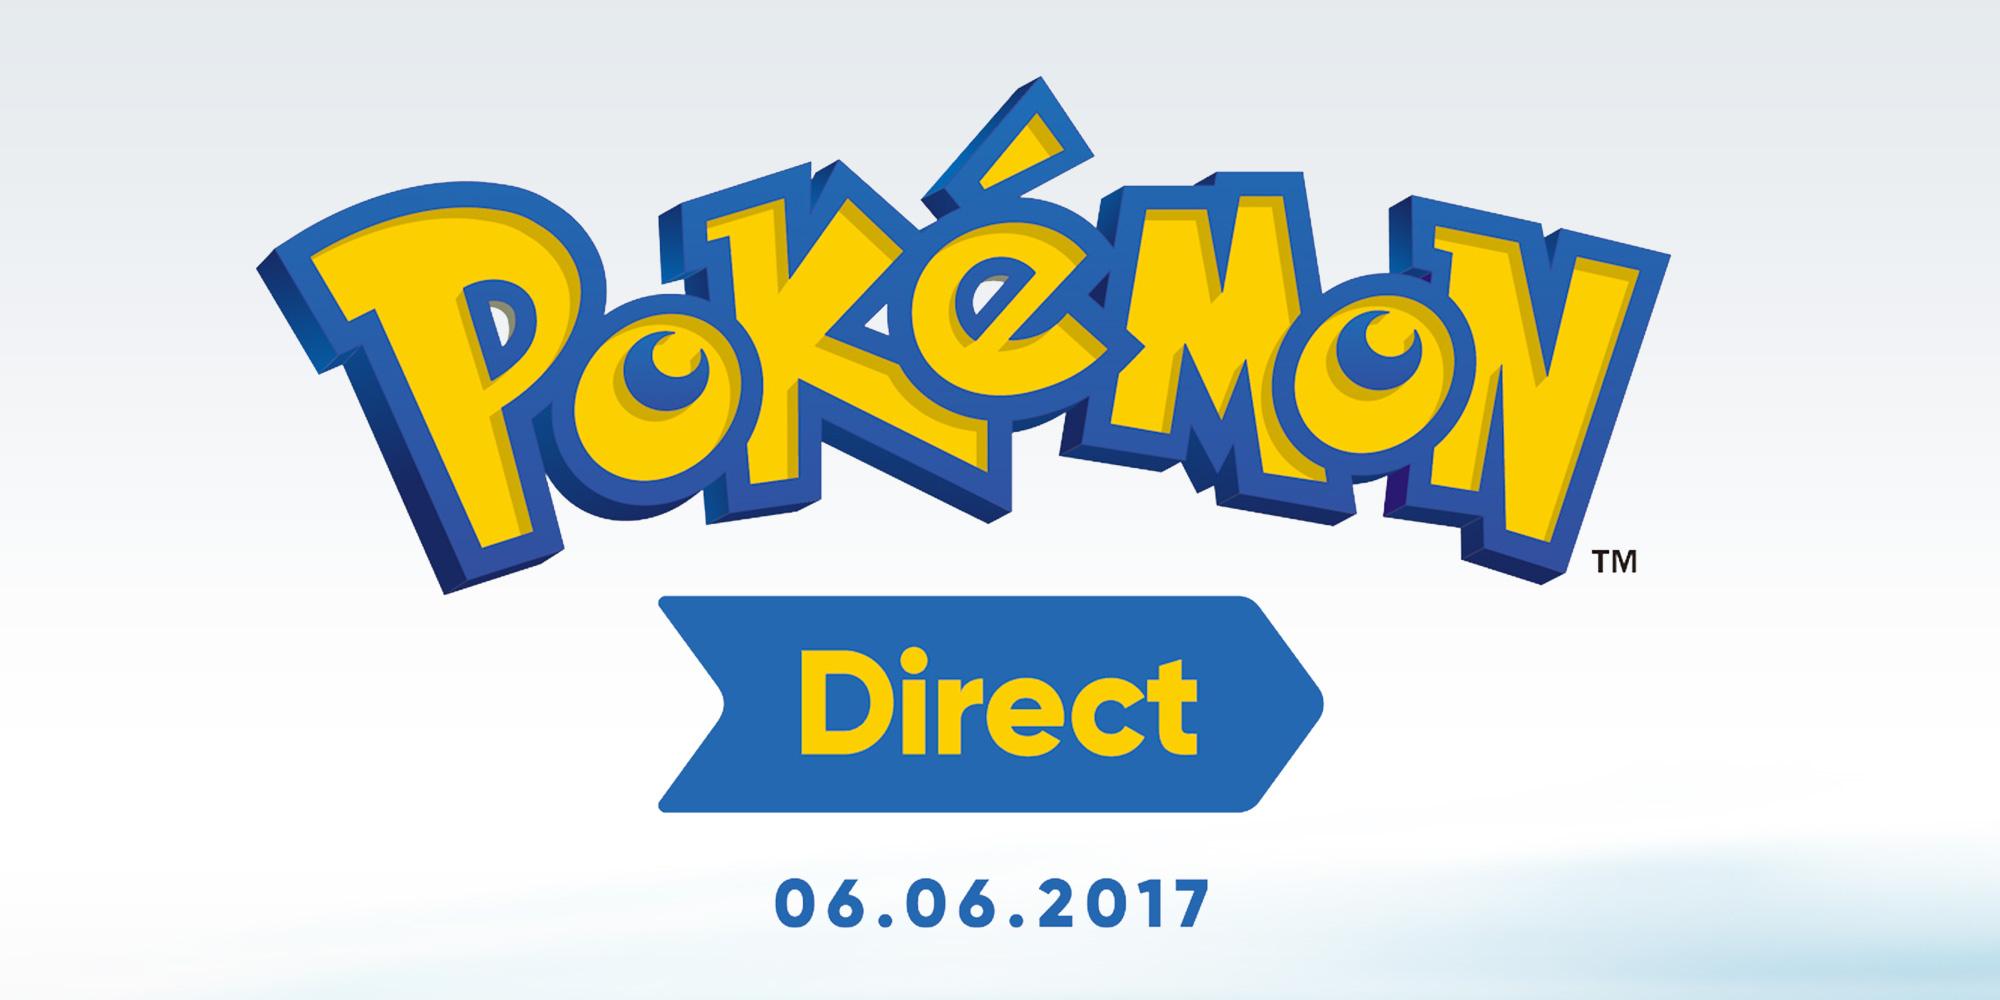 H2x1_PokemonDirect_06-06-2017